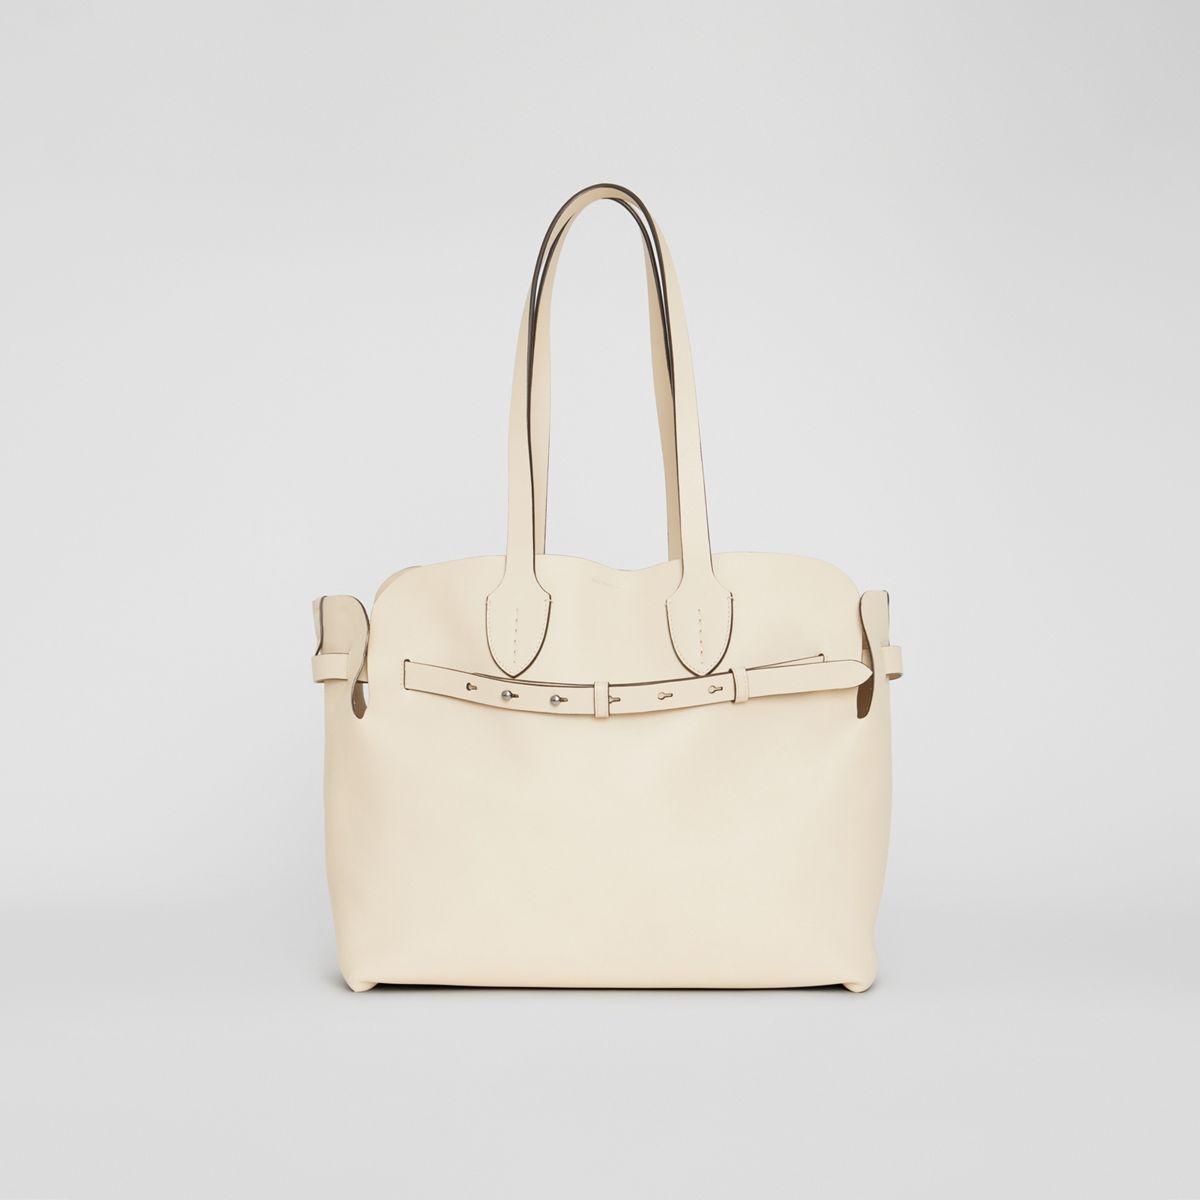 630ce87d74ef Burberry. Women s The Medium Soft Leather Belt Bag